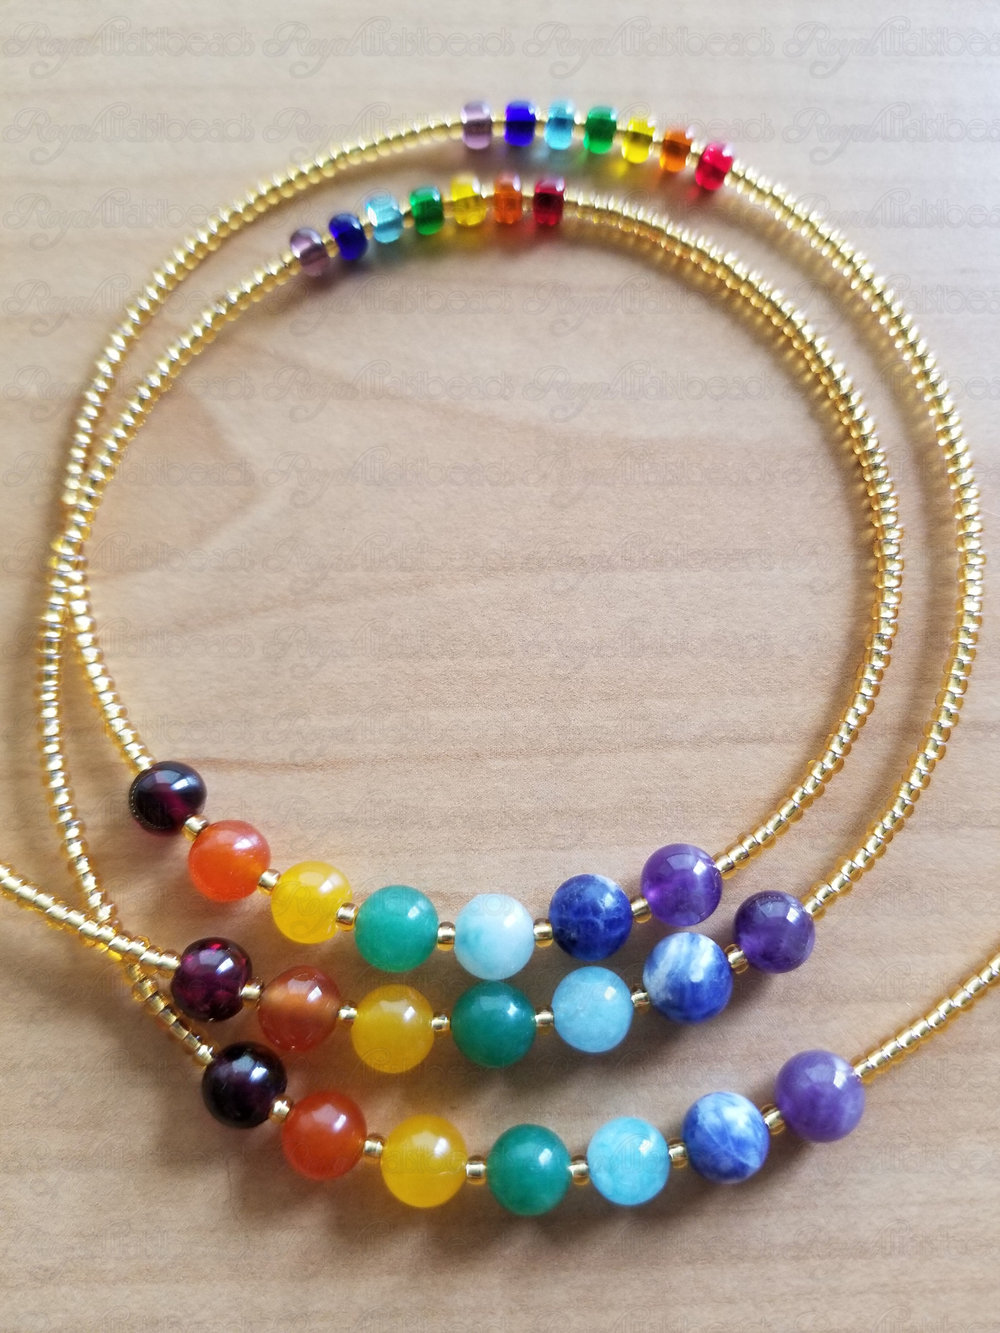 Wholesale Waist Bead Waist Trainers Adjustable Thread Belly Beads BUY 5 GET 5 FREE African Waist Beads Waist Chains Tribal Waist Beads